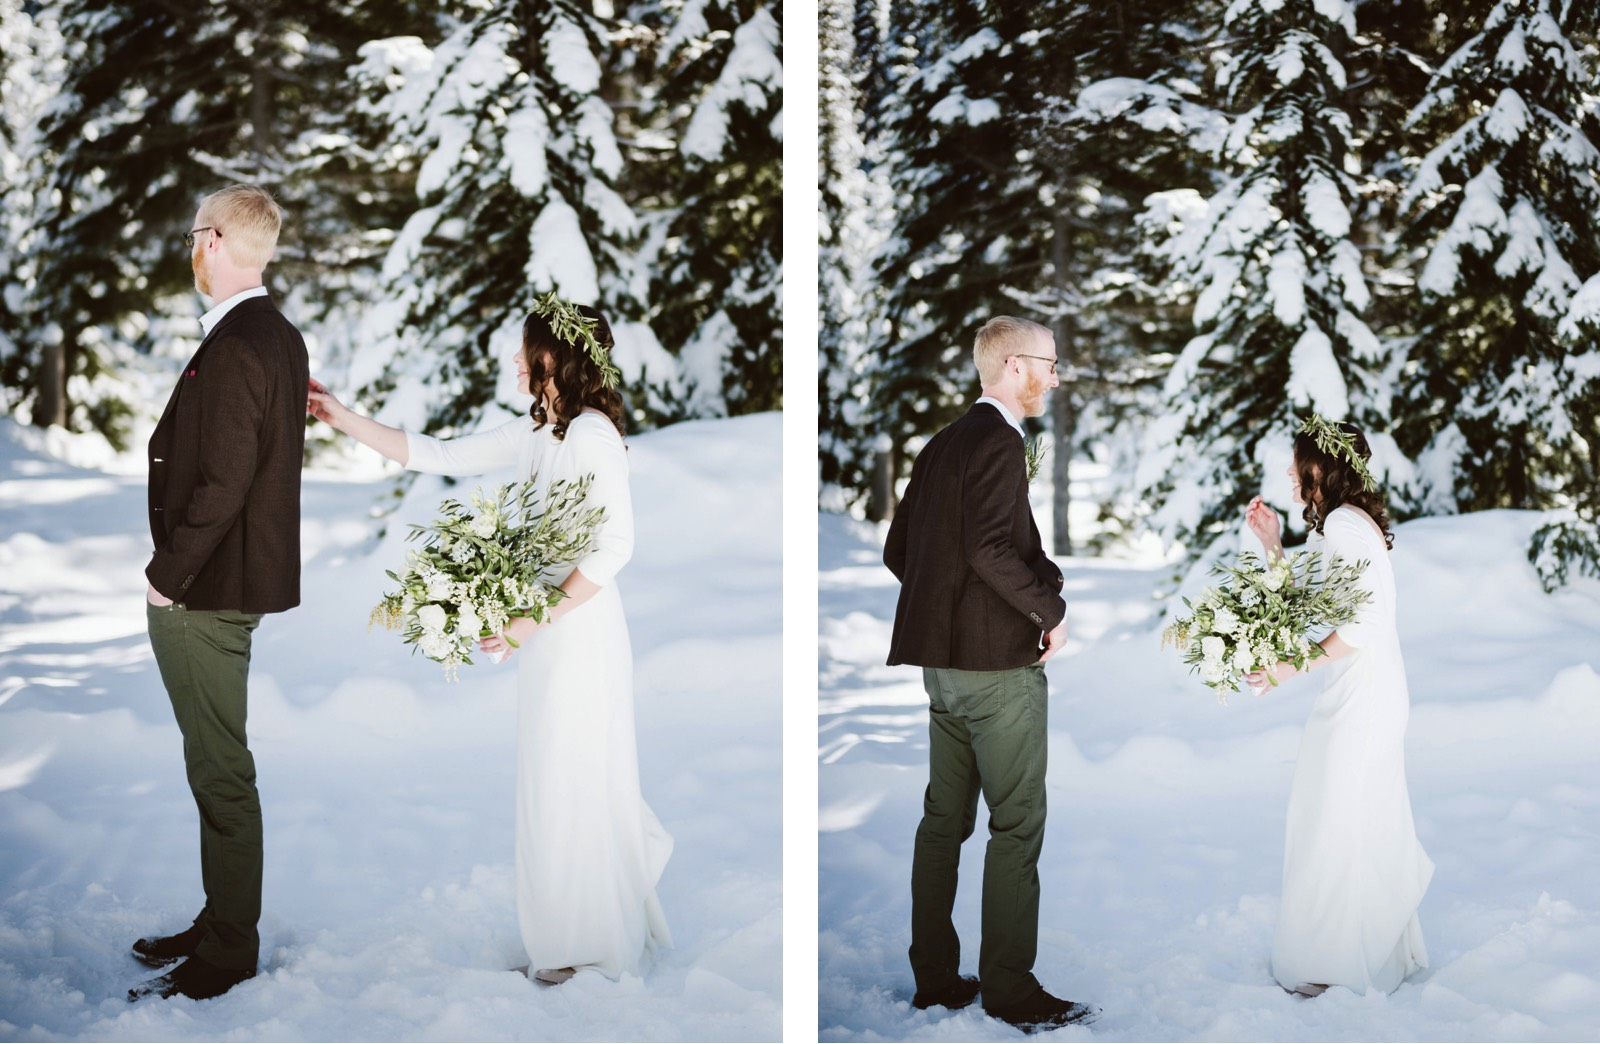 alpine-lakes-high-camp-winter-wedding-17 ALPINE LAKES HIGH CAMP WEDDING